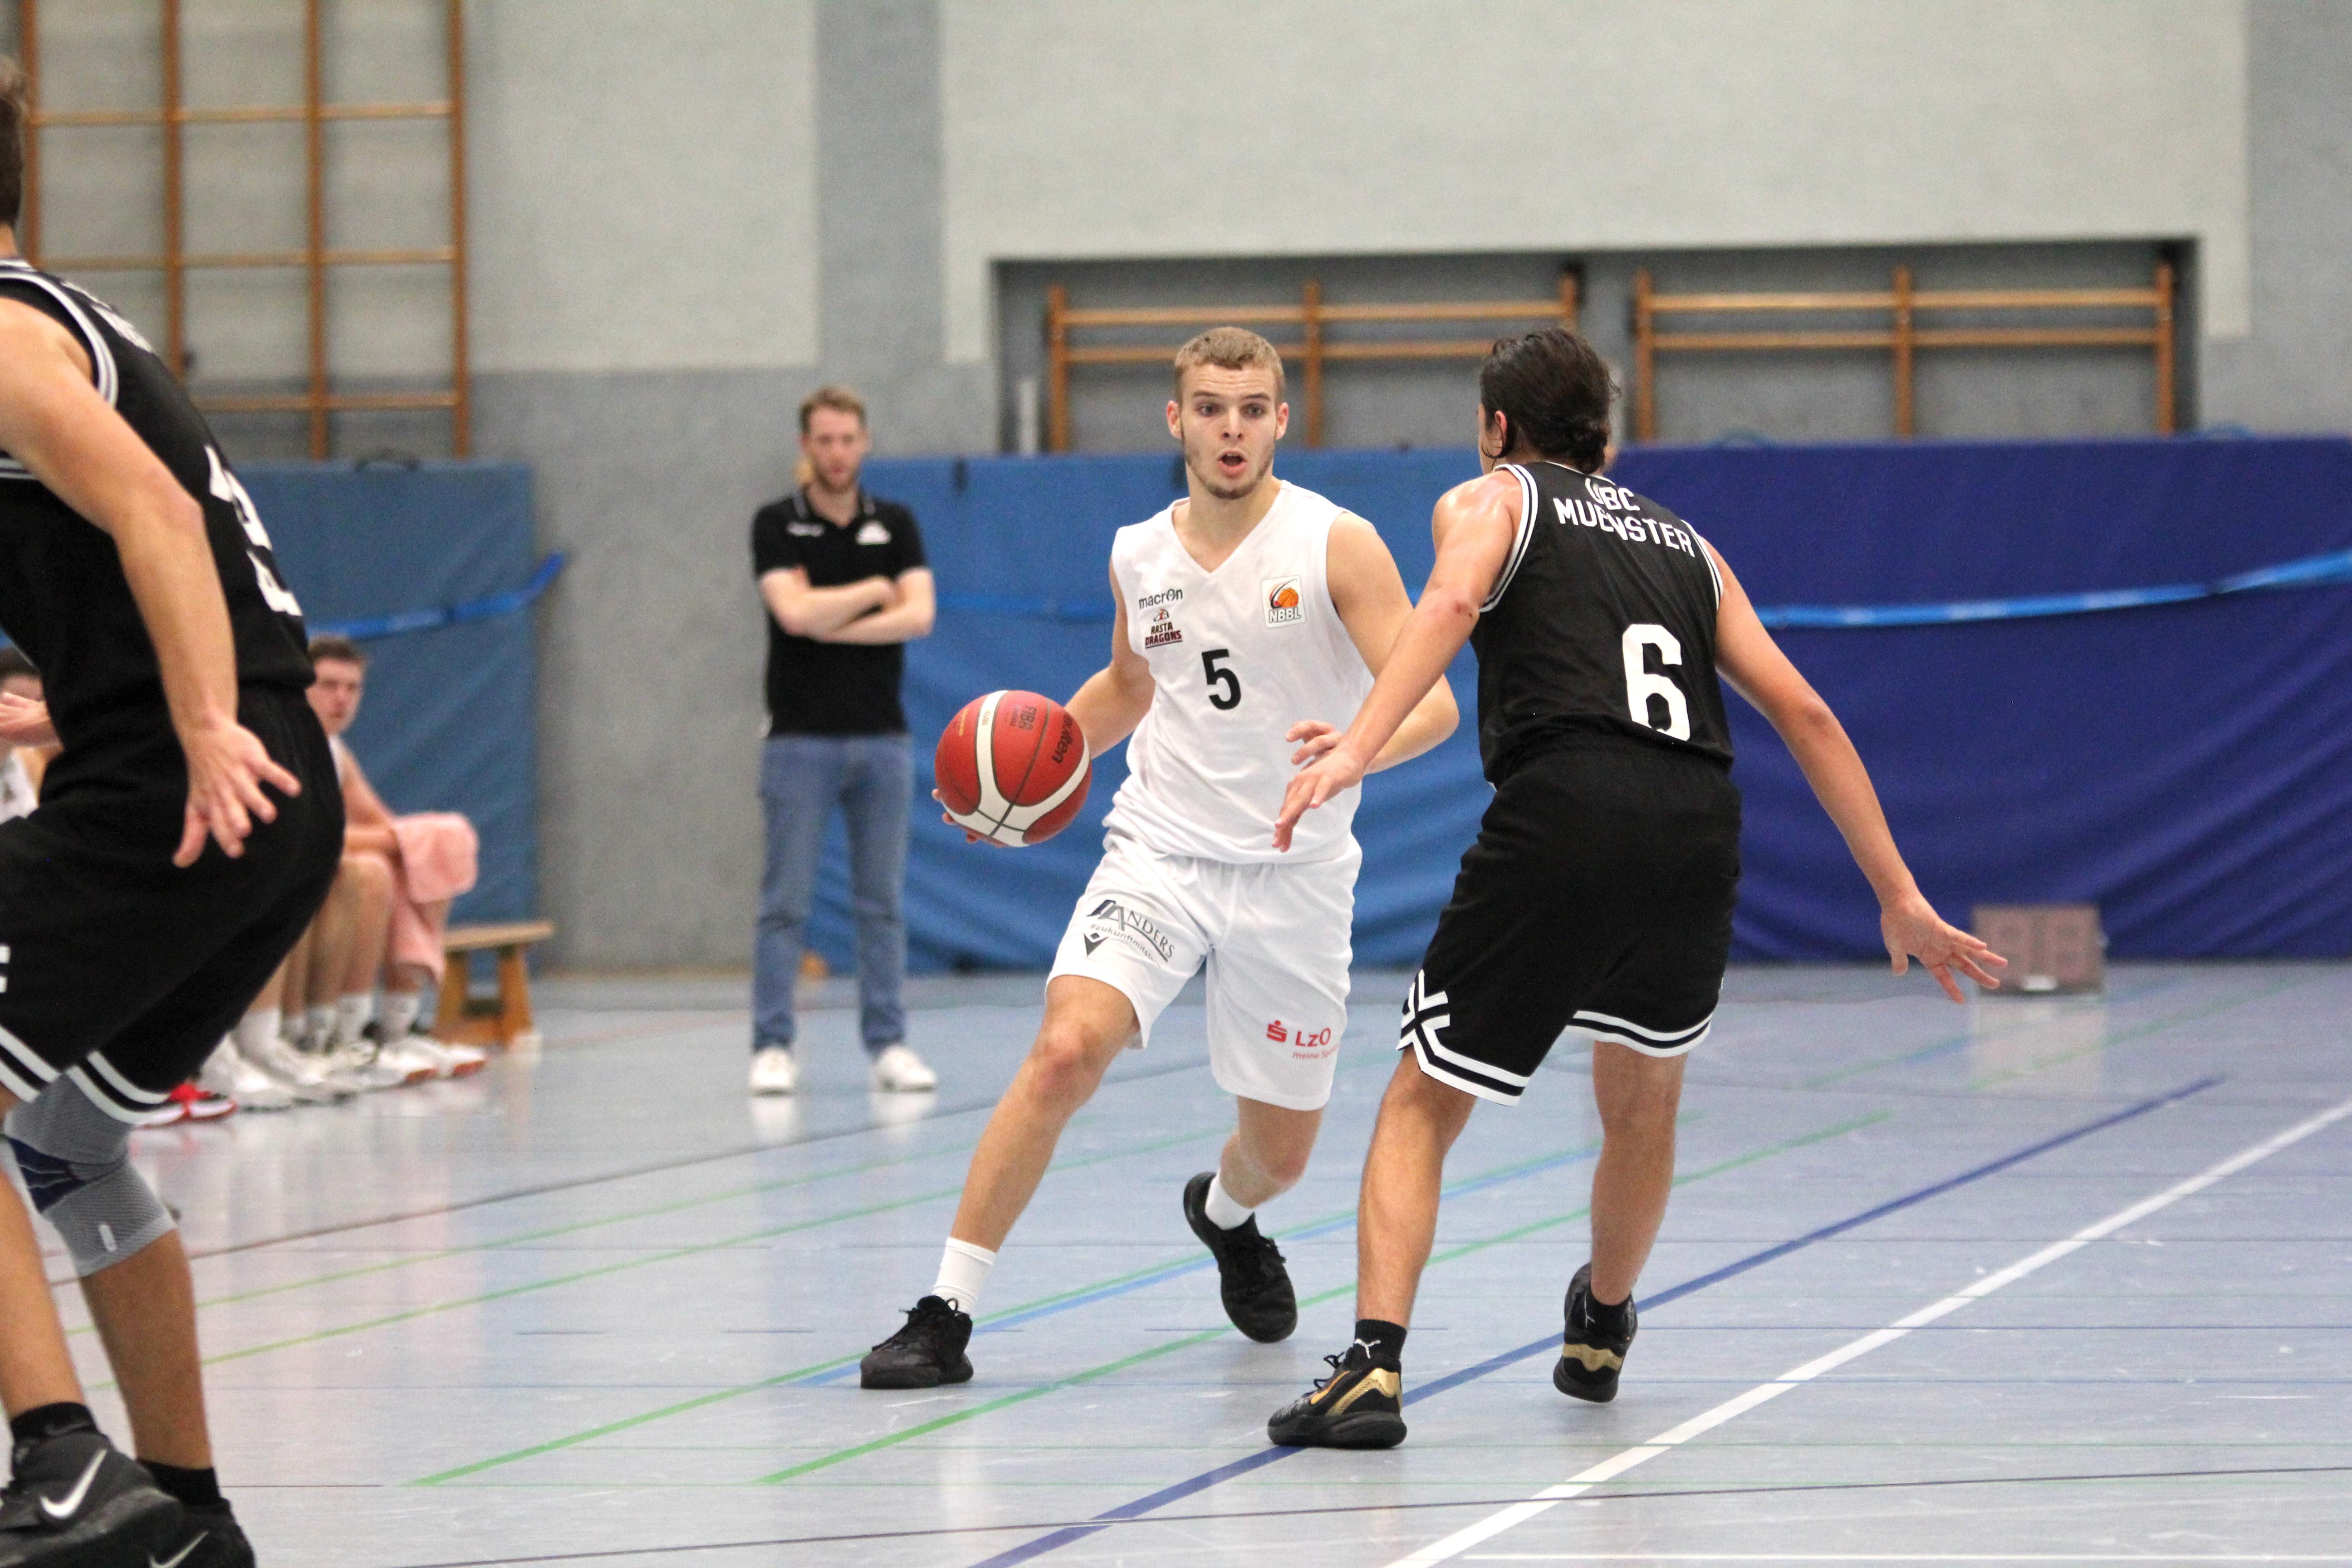 NBBL_20-21_YOUNG-RASTA-DRAGONS_Münster_Spieltag1_Torge-Buthmann_19